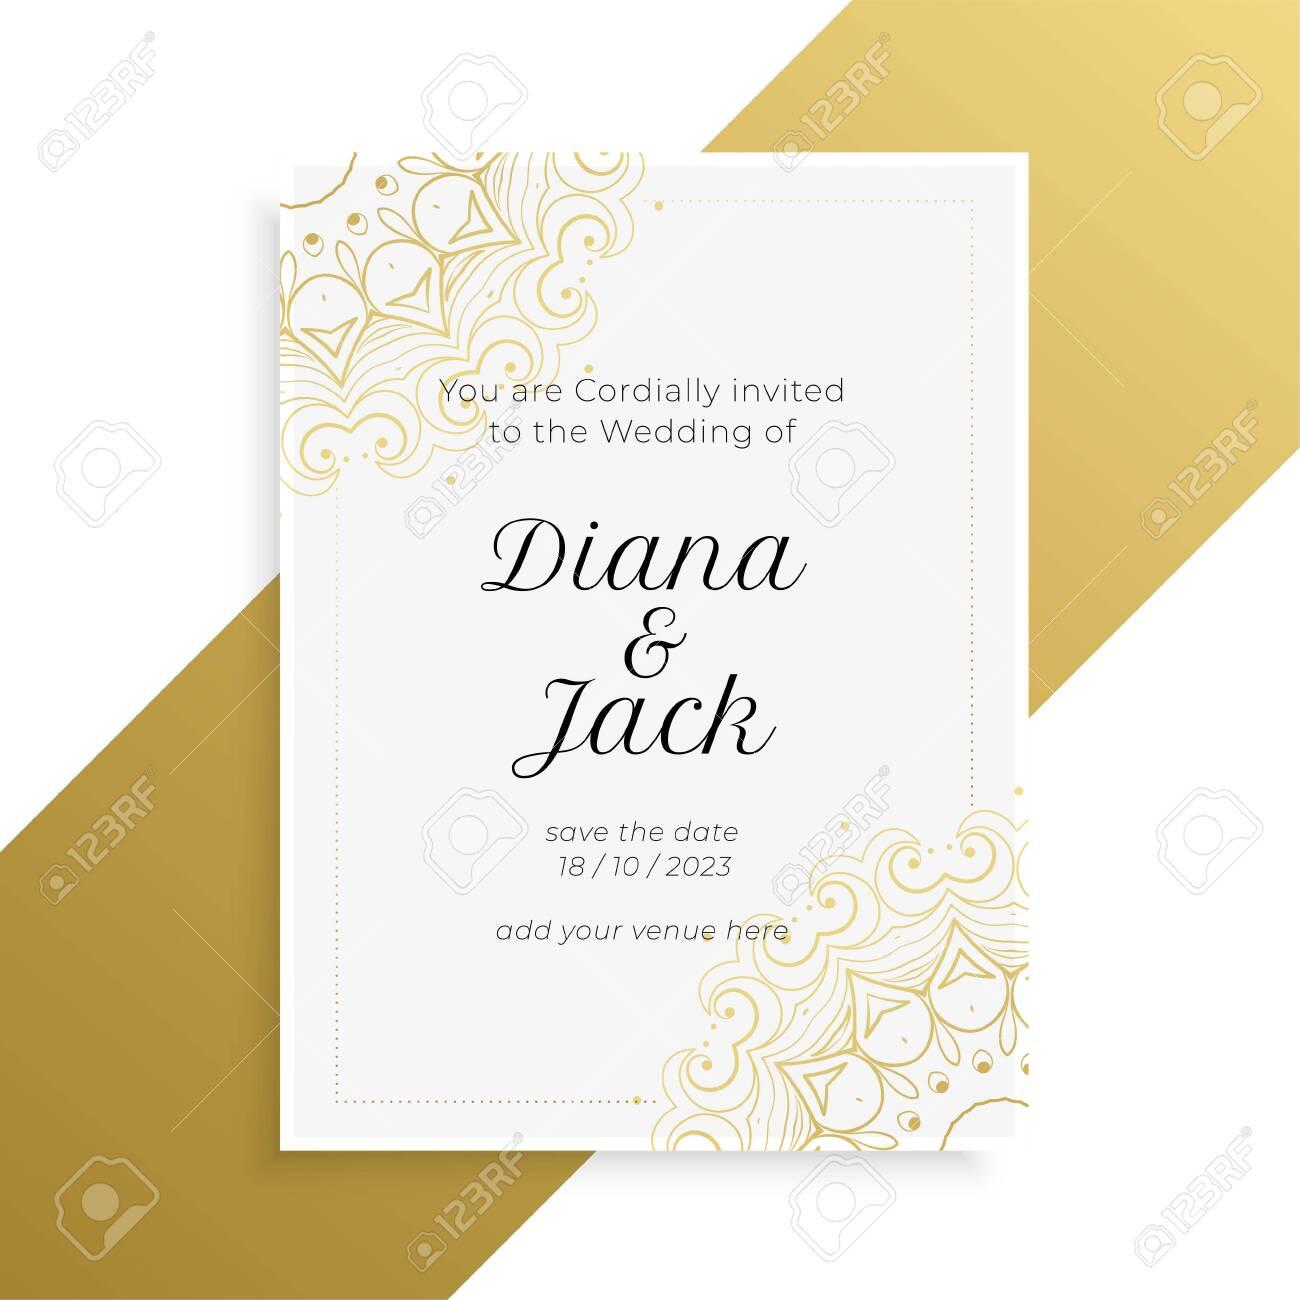 lovely golden and white wedding invitation card design